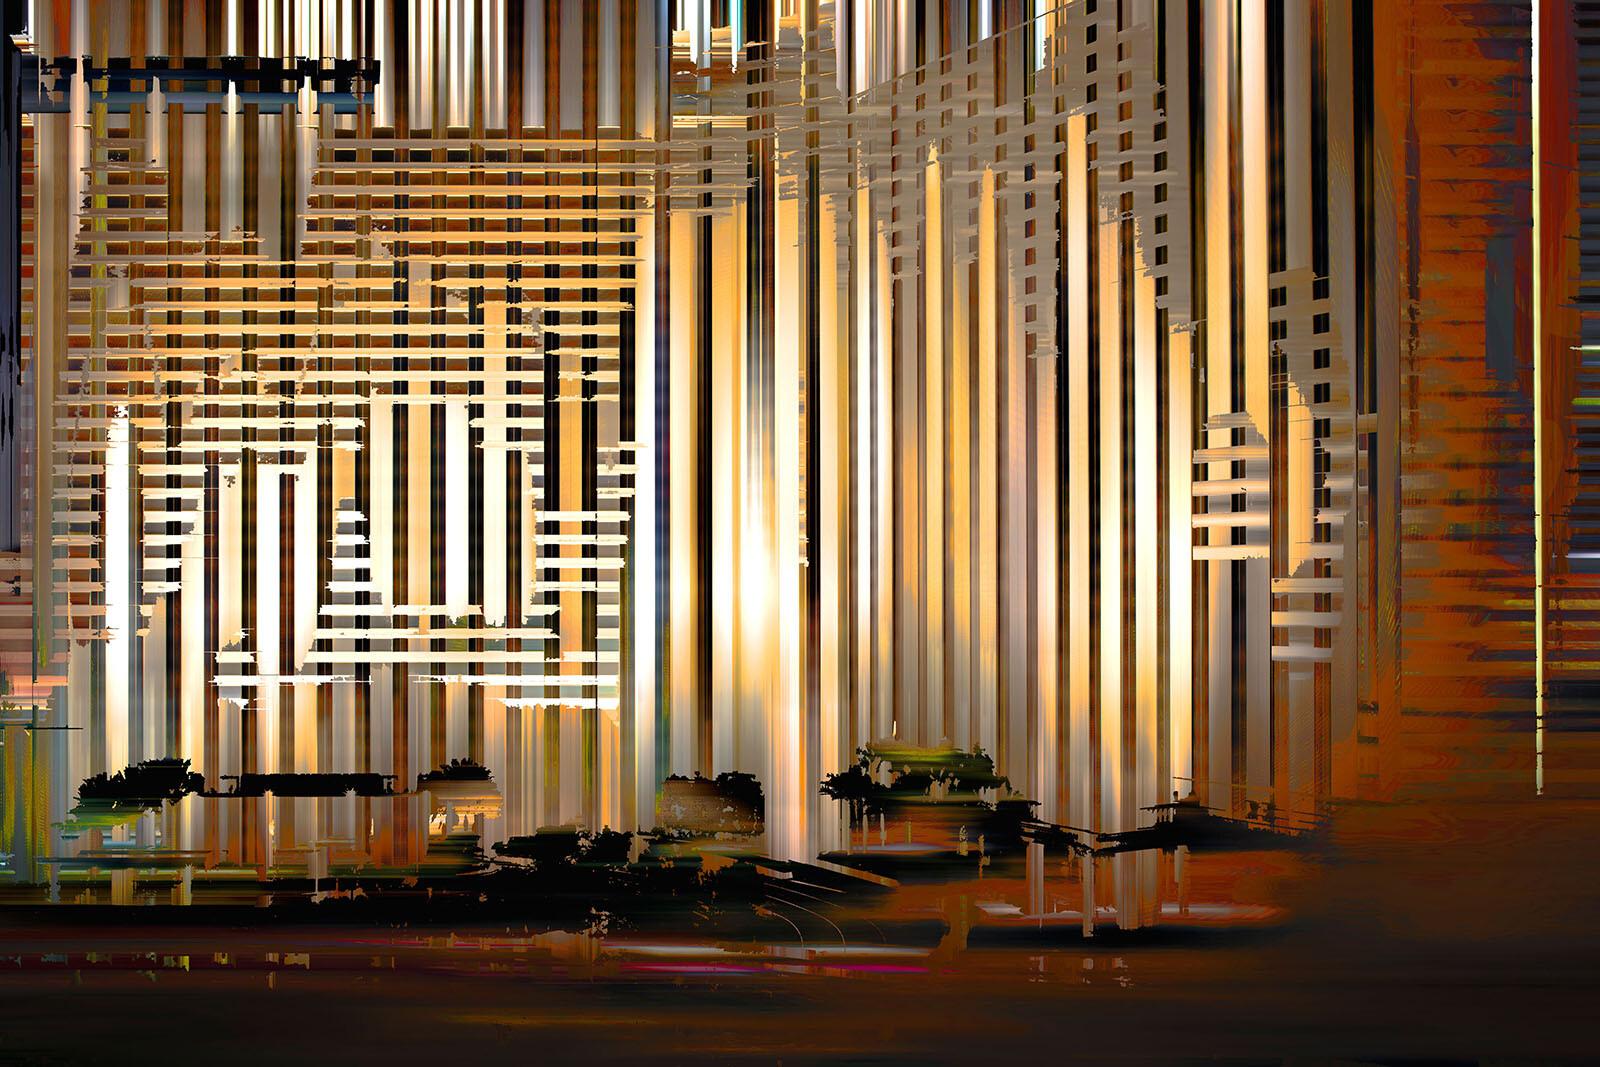 Las Vegas Projection I - Sabine Wild